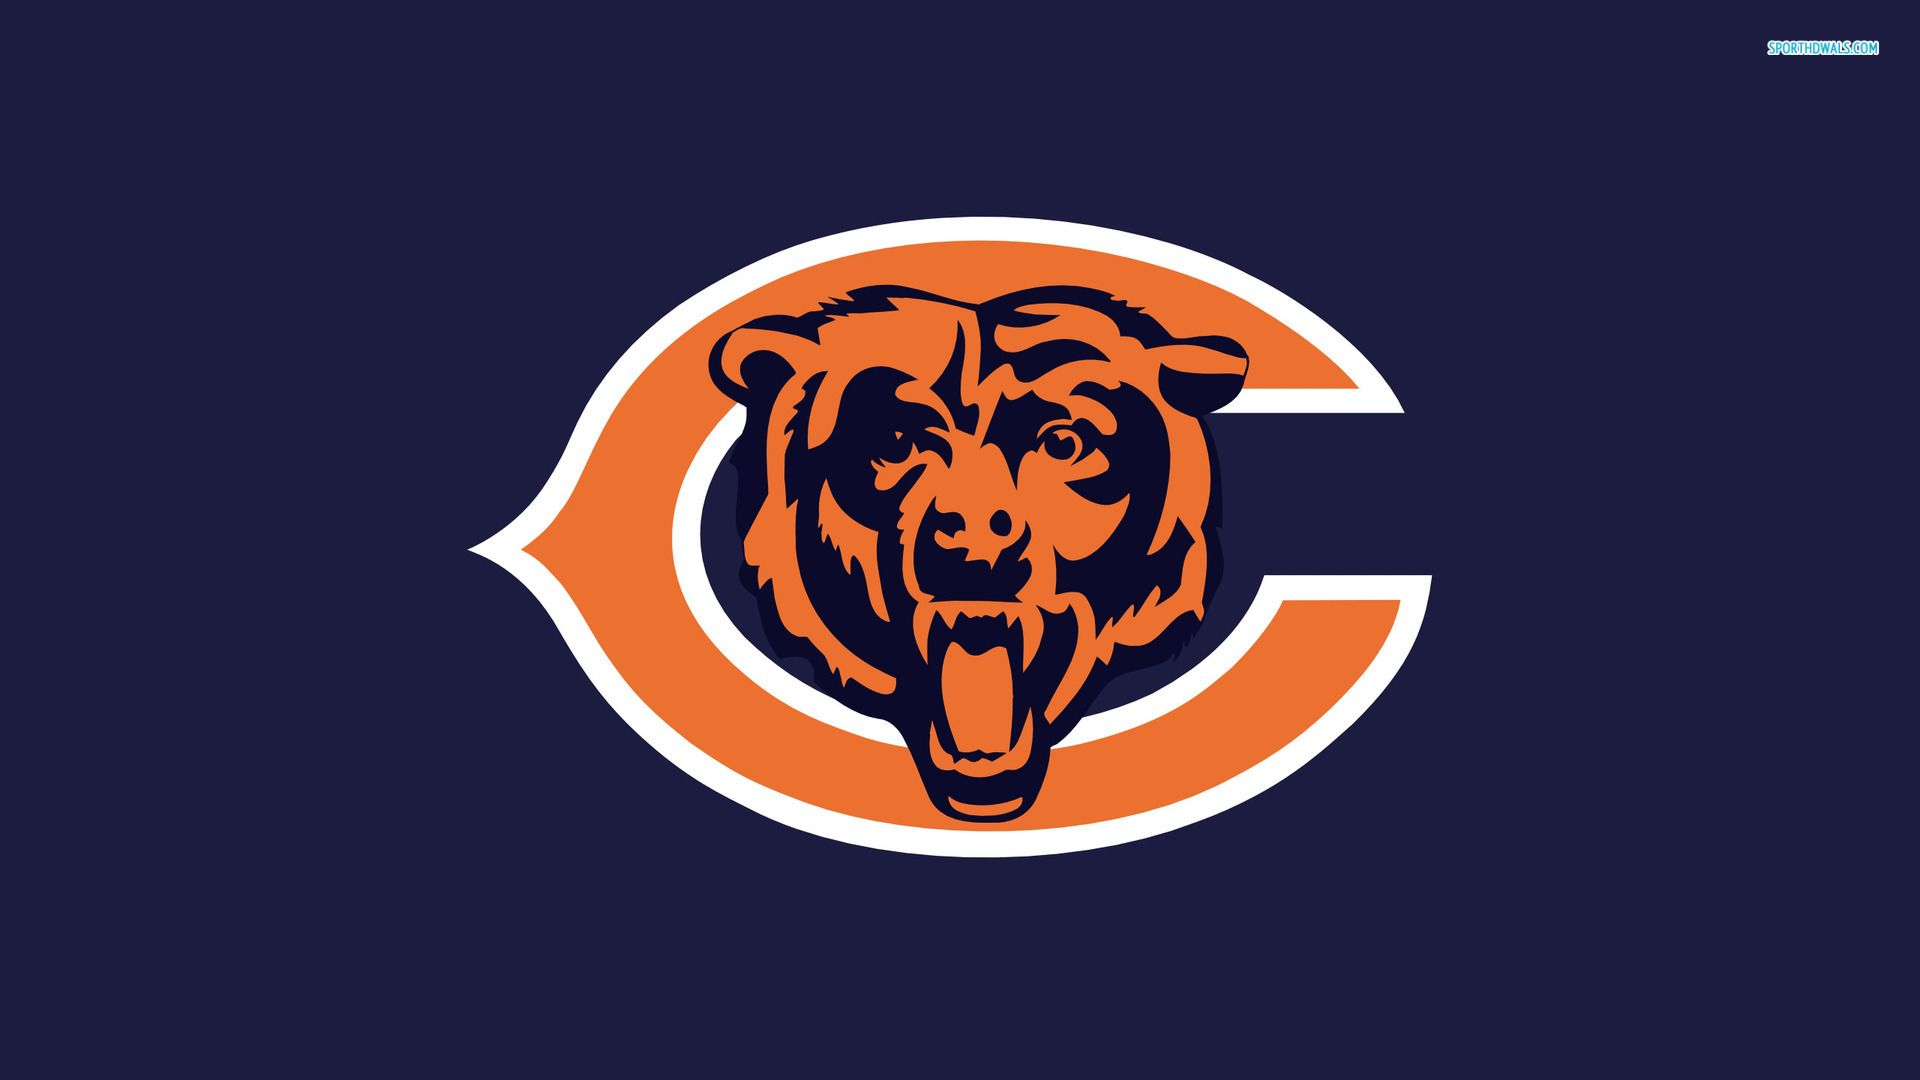 chicago bears Chicago Bears wallpaper 1920x1080